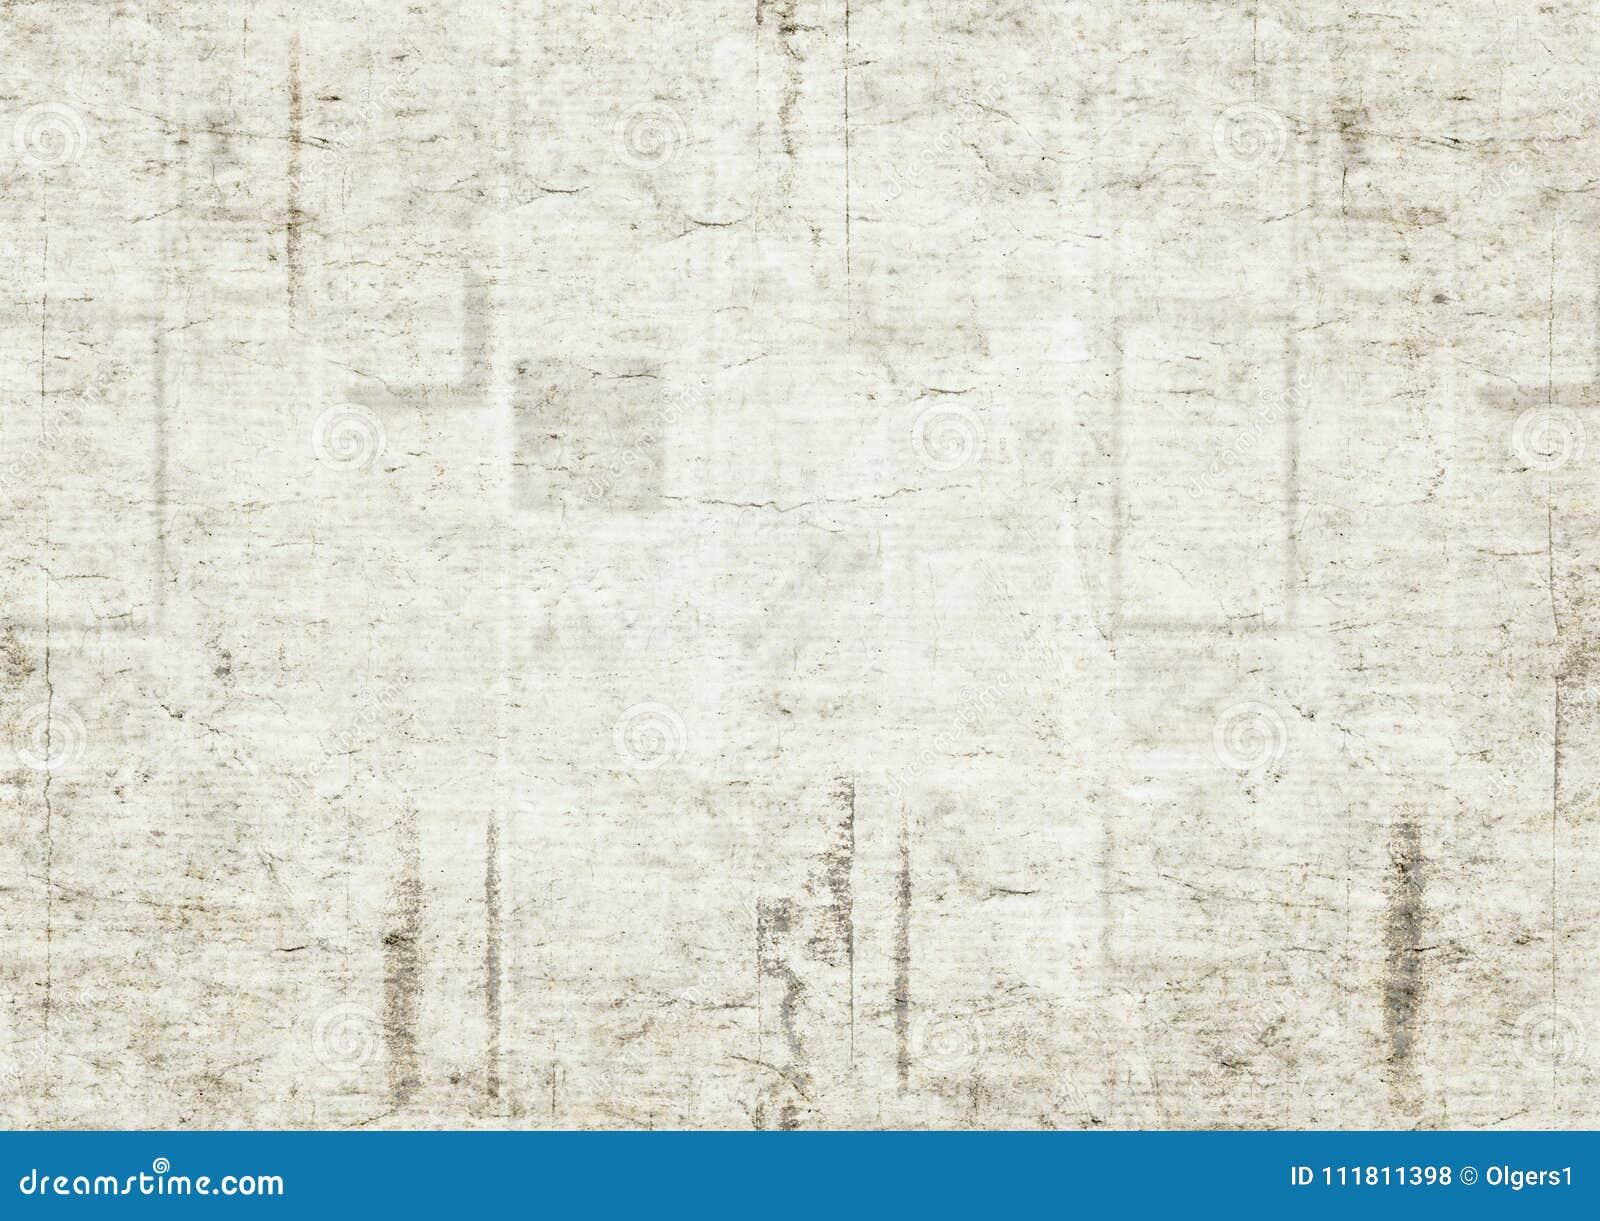 old newspaper texture background stock illustration - illustration